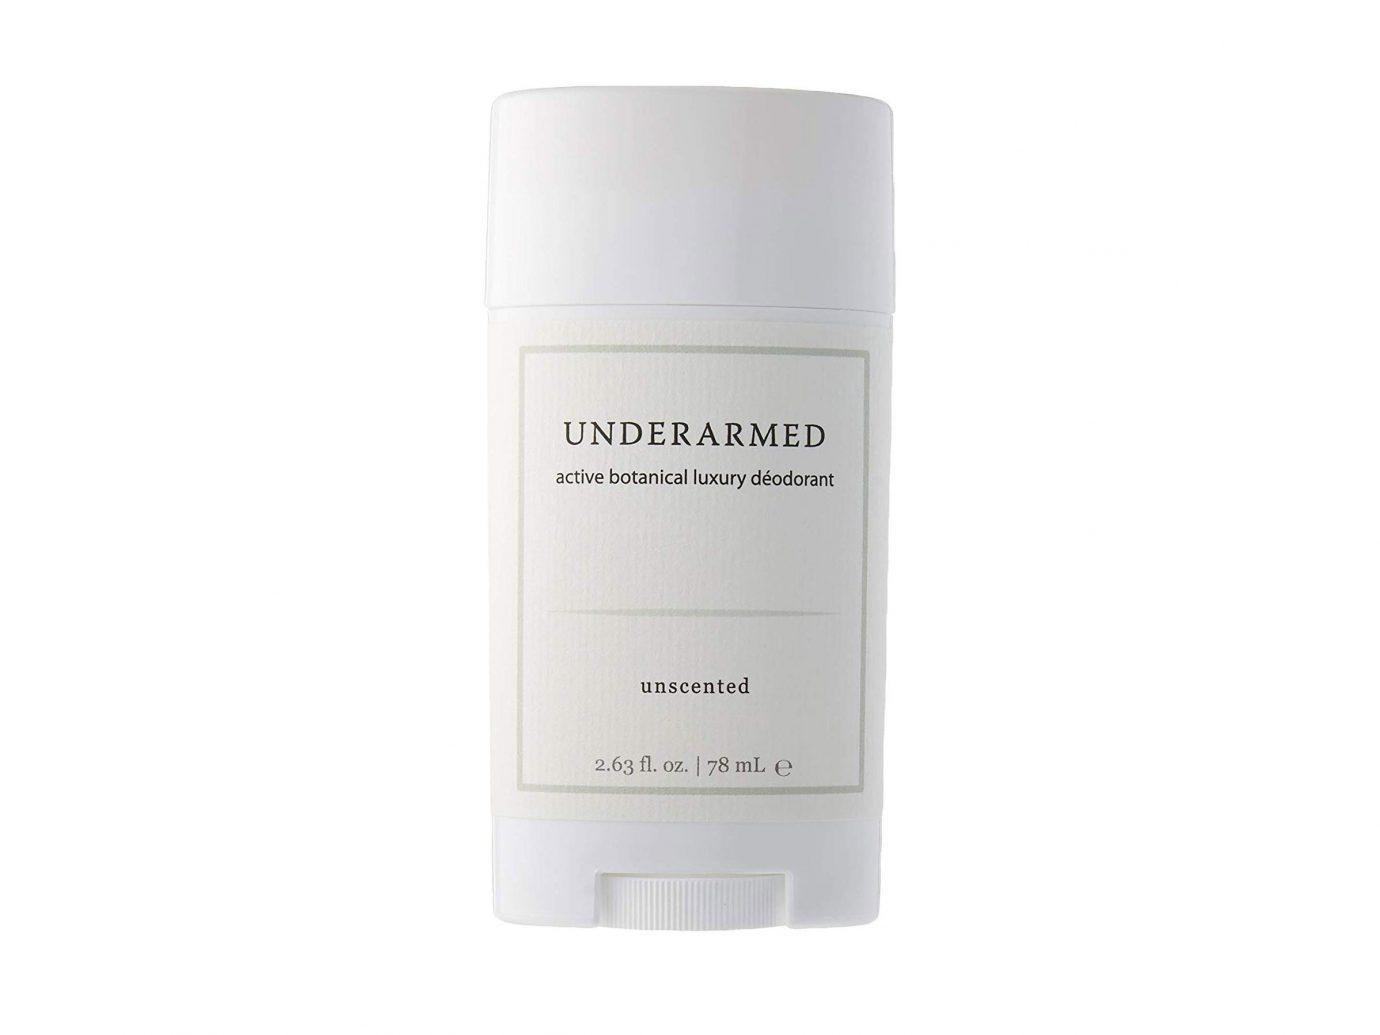 Underarmed Natural Active Botanical Deodorant